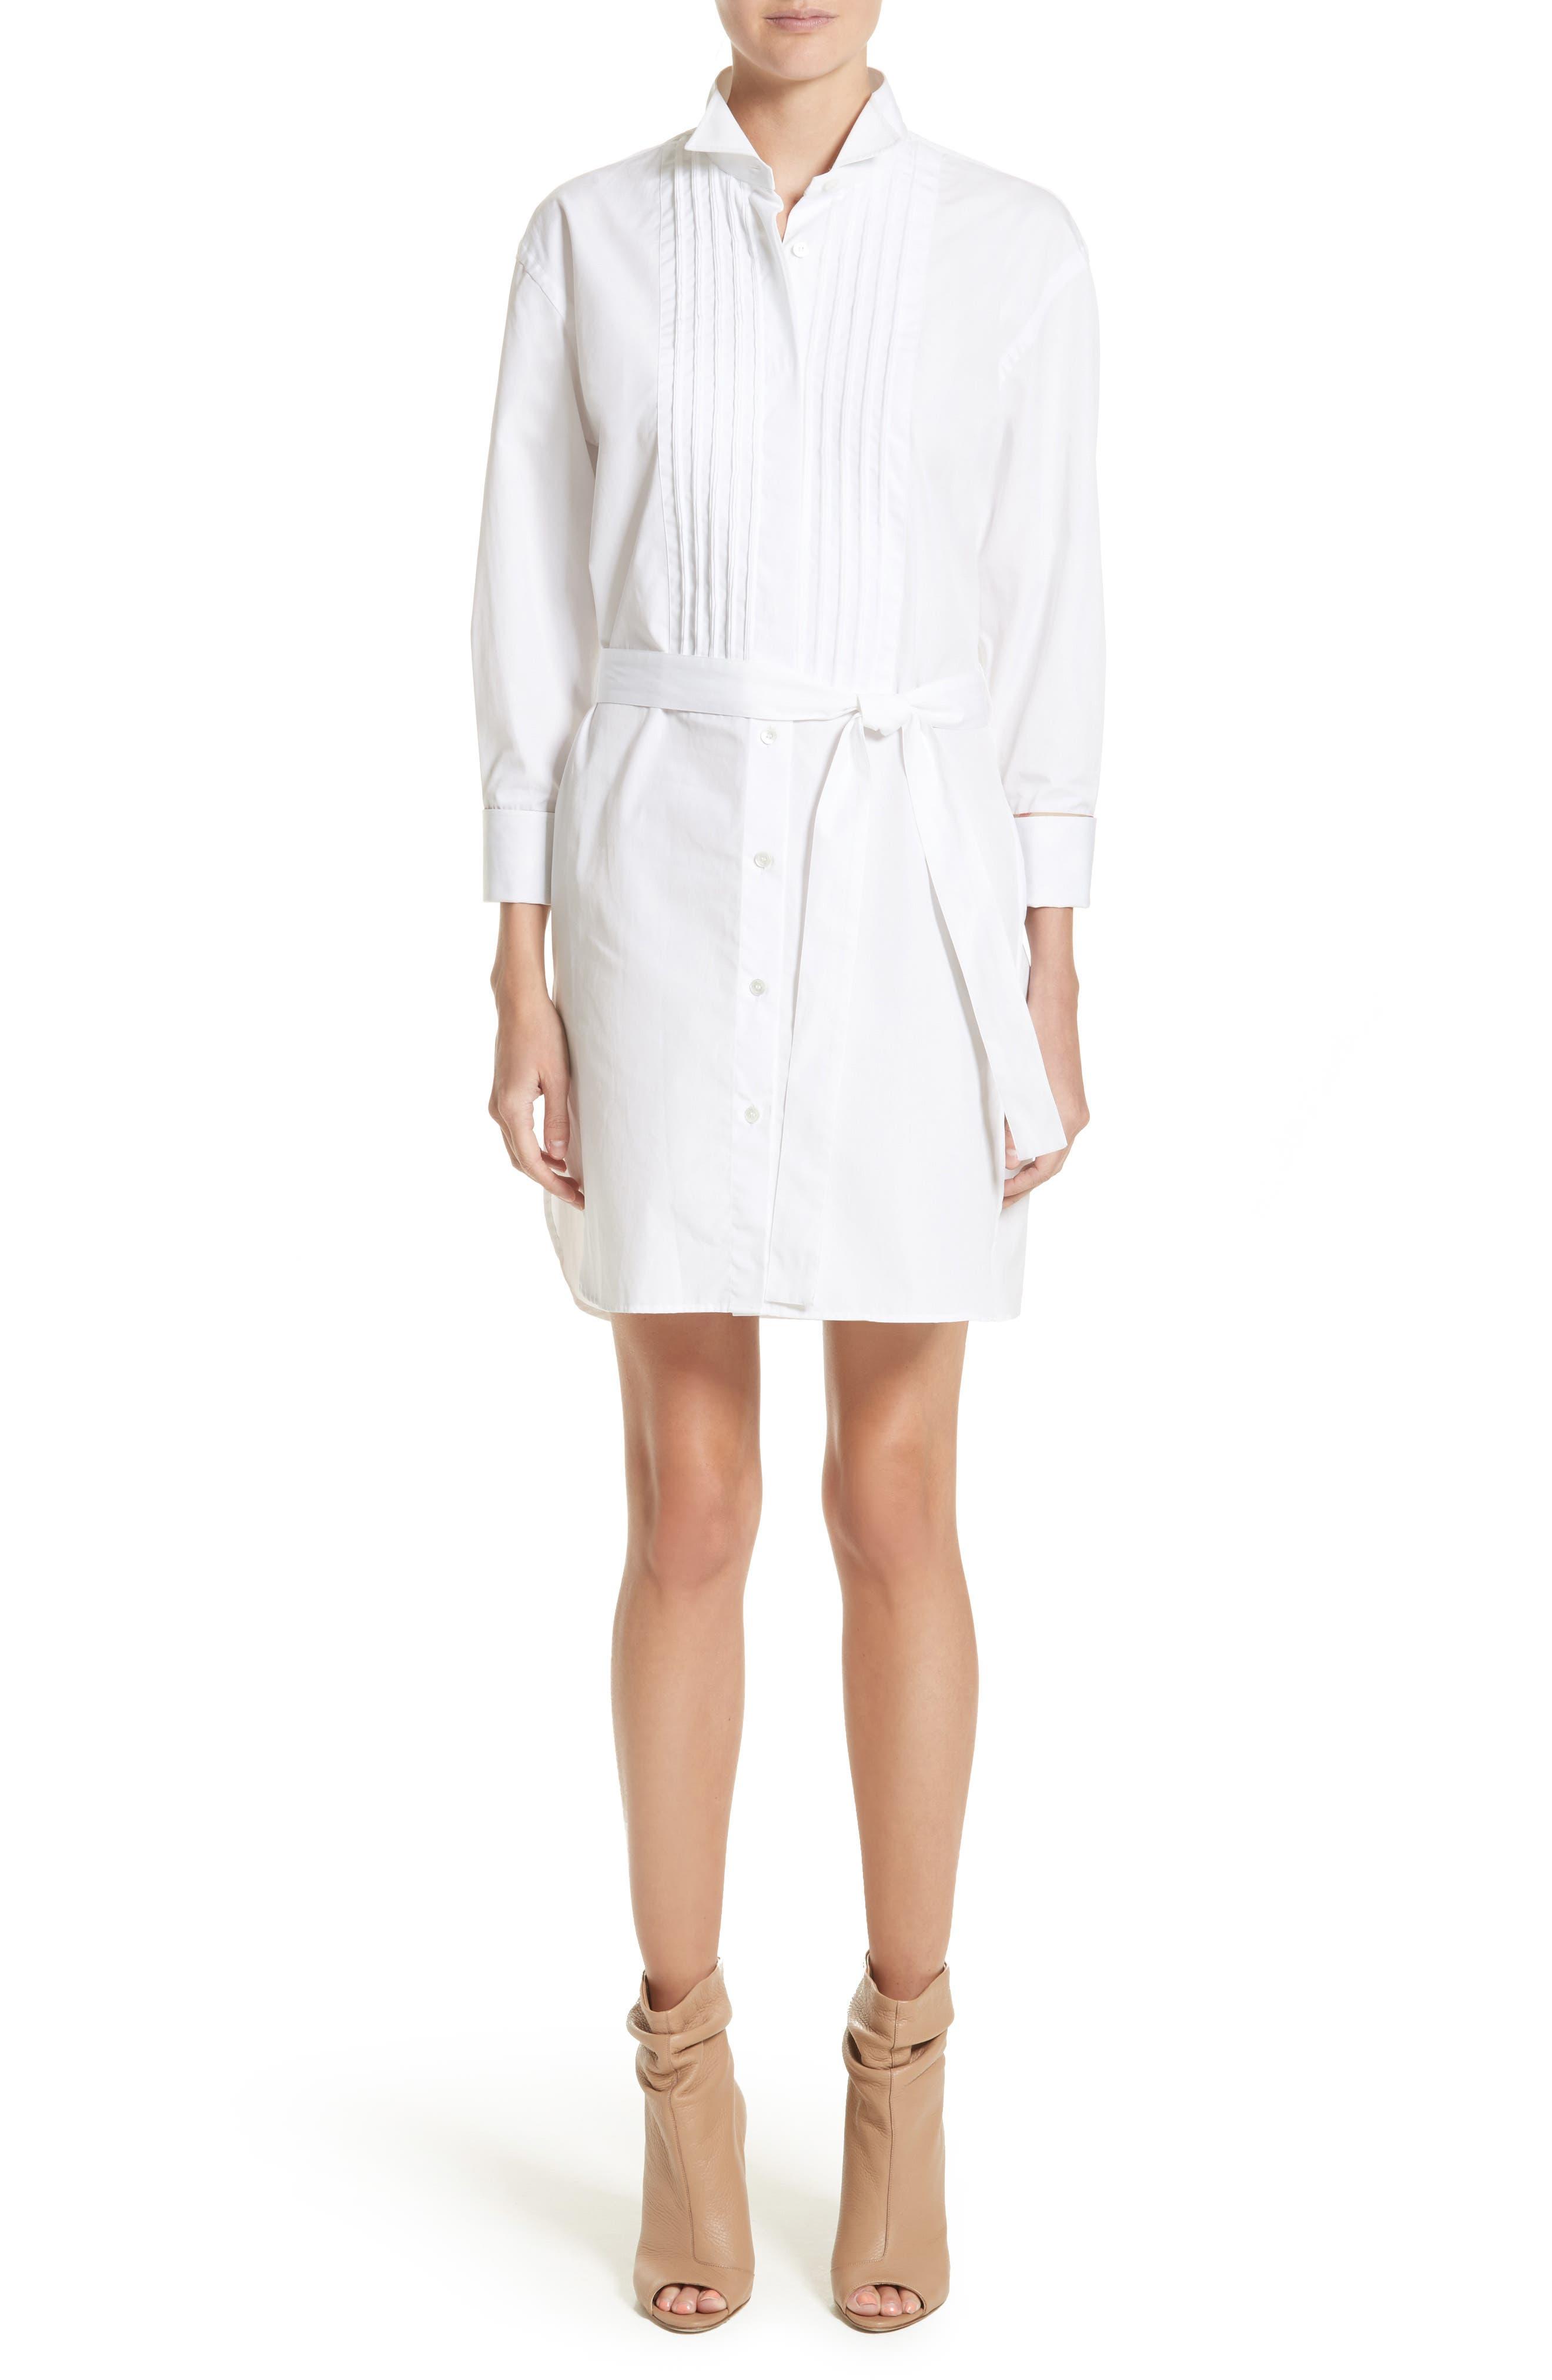 Burberry Madeline Cotton Poplin Shirtdress